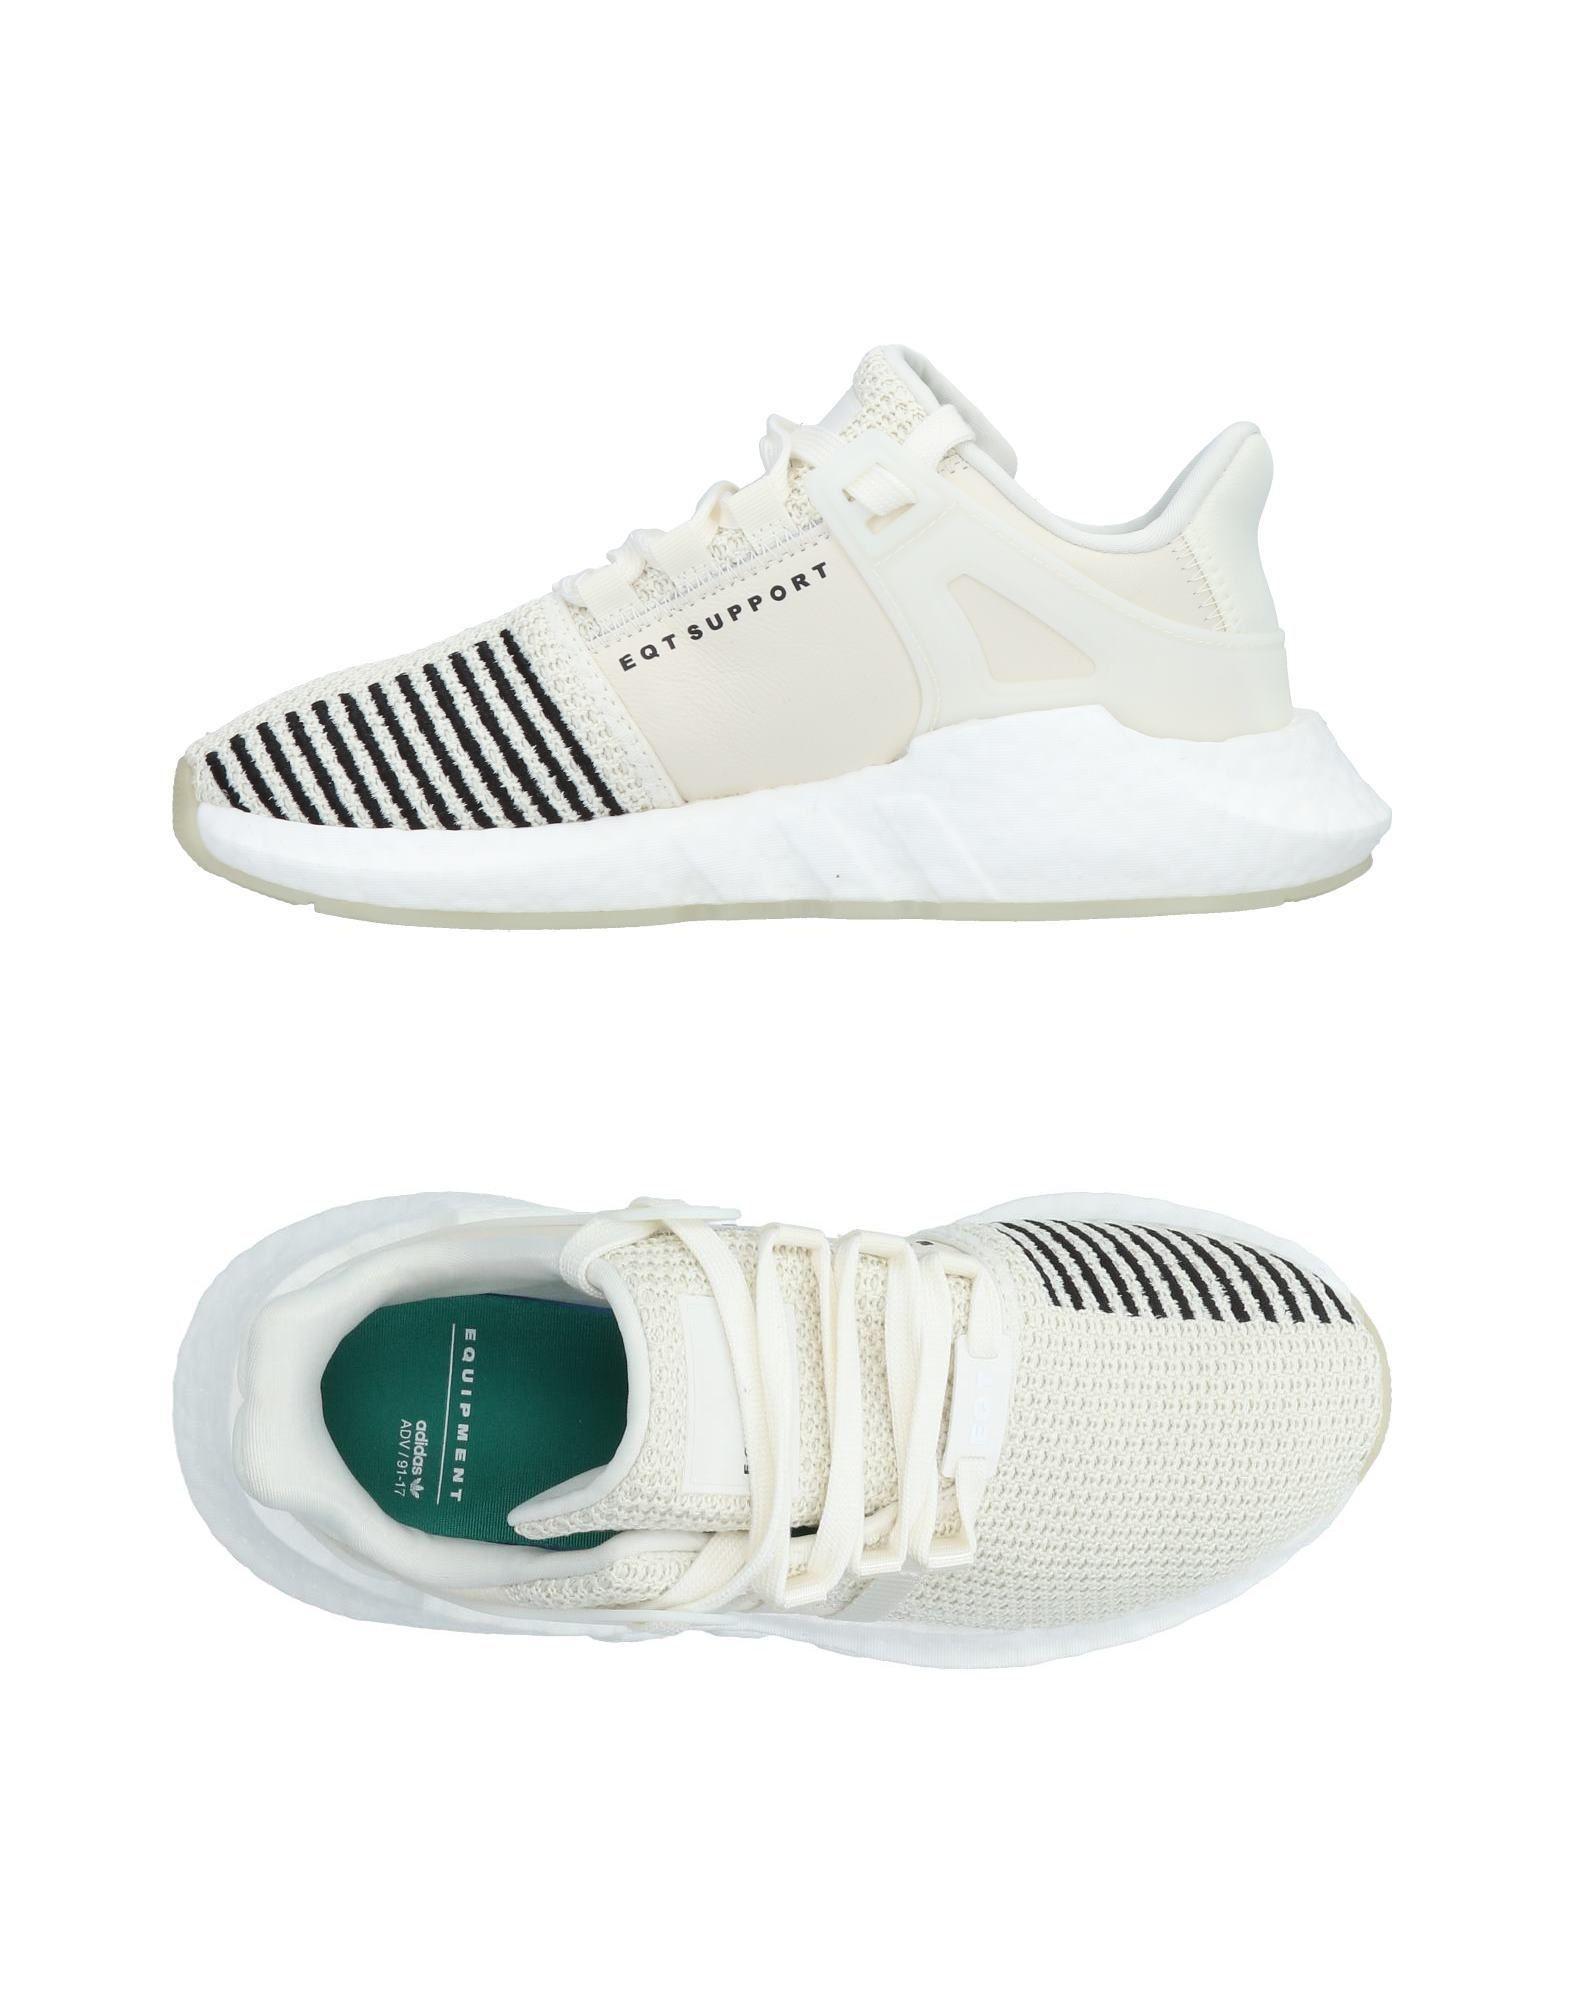 adidas Originals Leder Low Sneakers & Tennisschuhe in Weiß